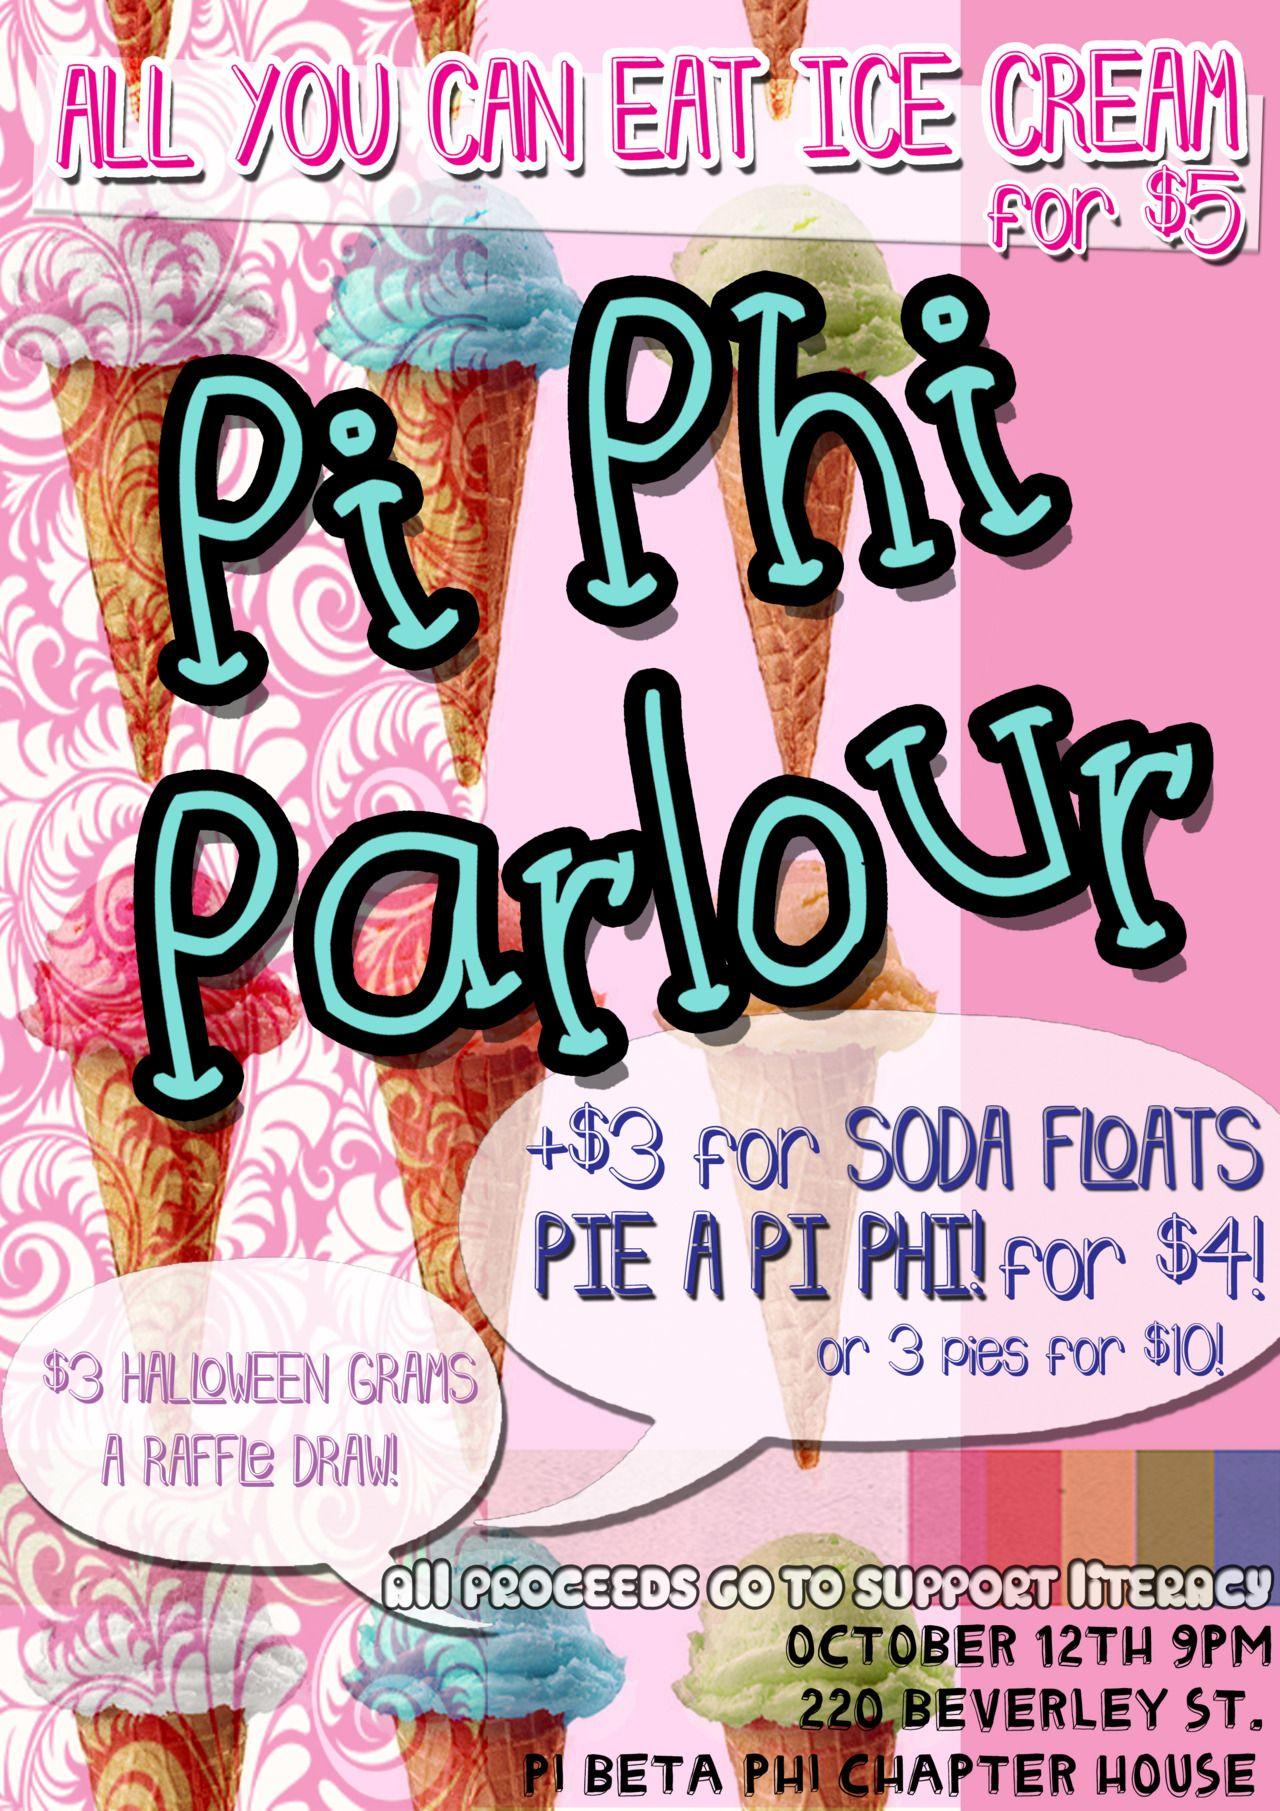 pi phi parlour- cute philanthropy idea #piphi #pibetaphi | pi beta